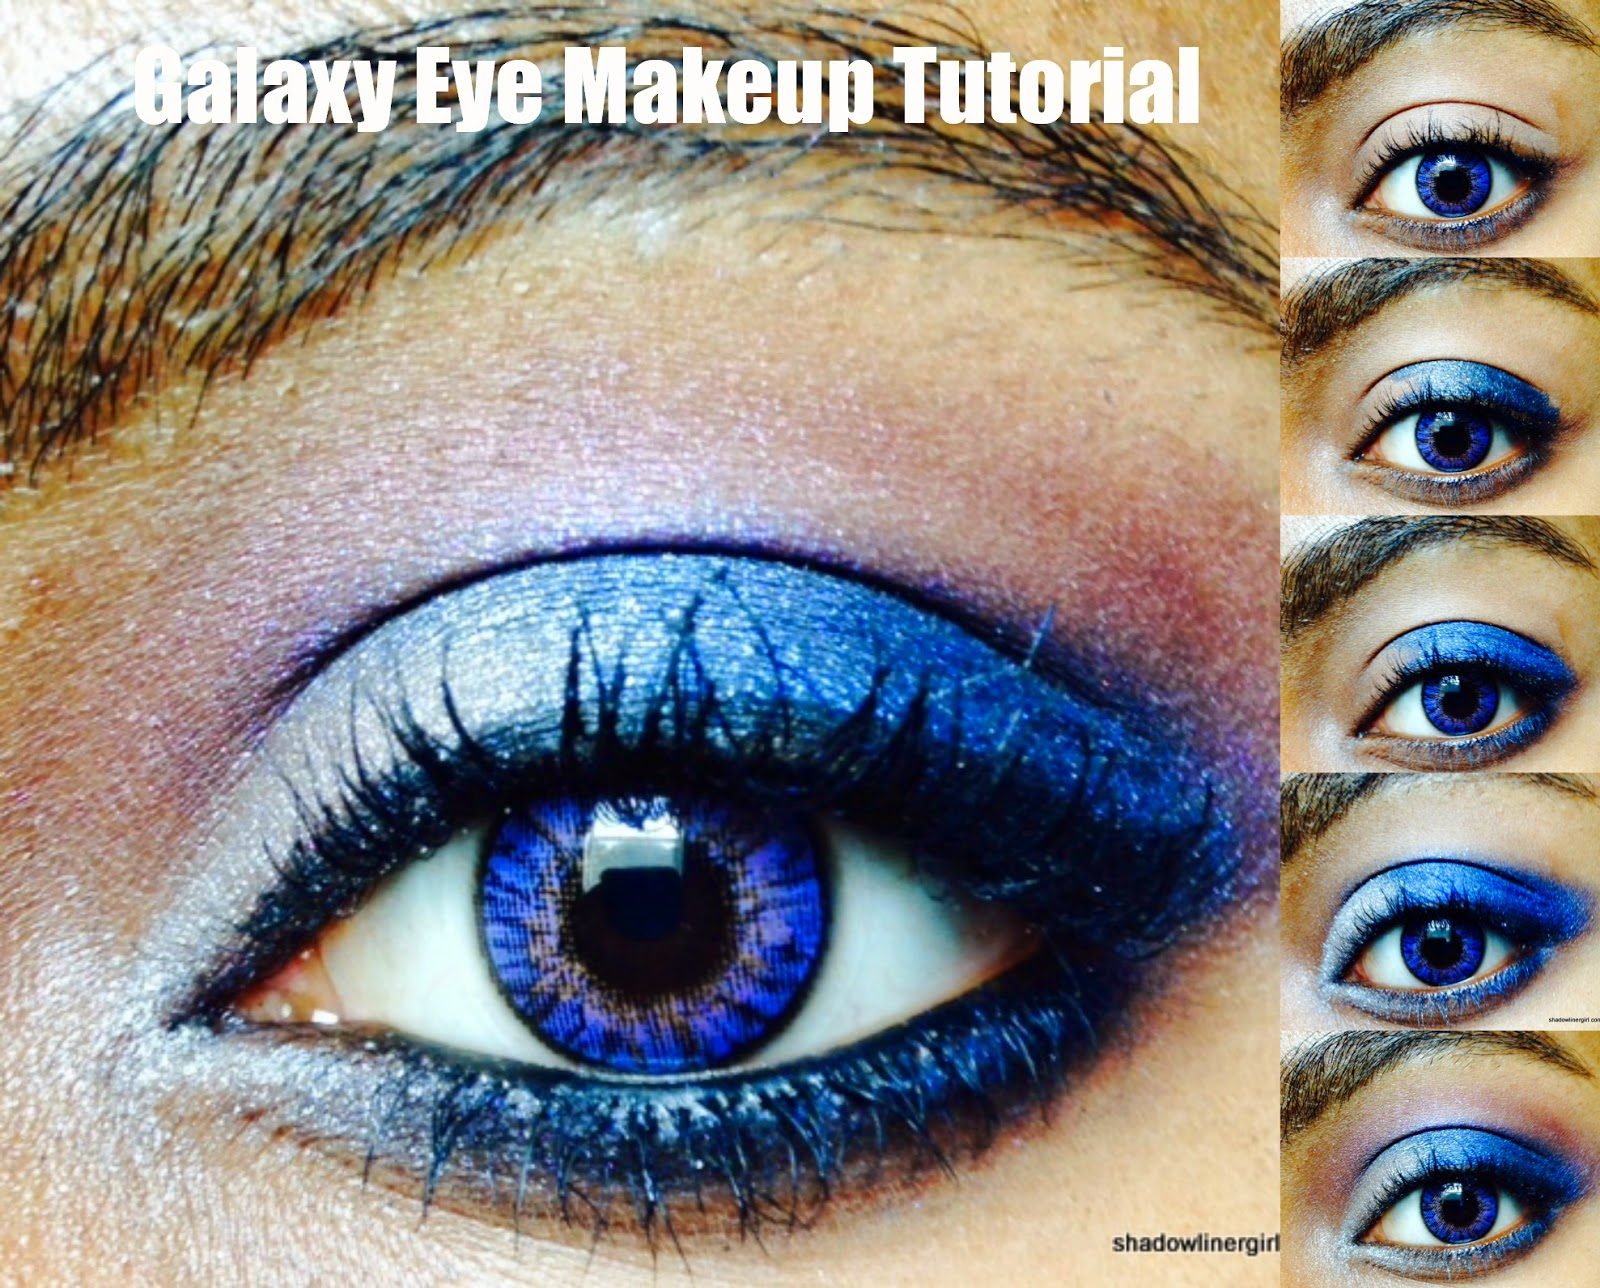 Galaxy eye makeup tutorial